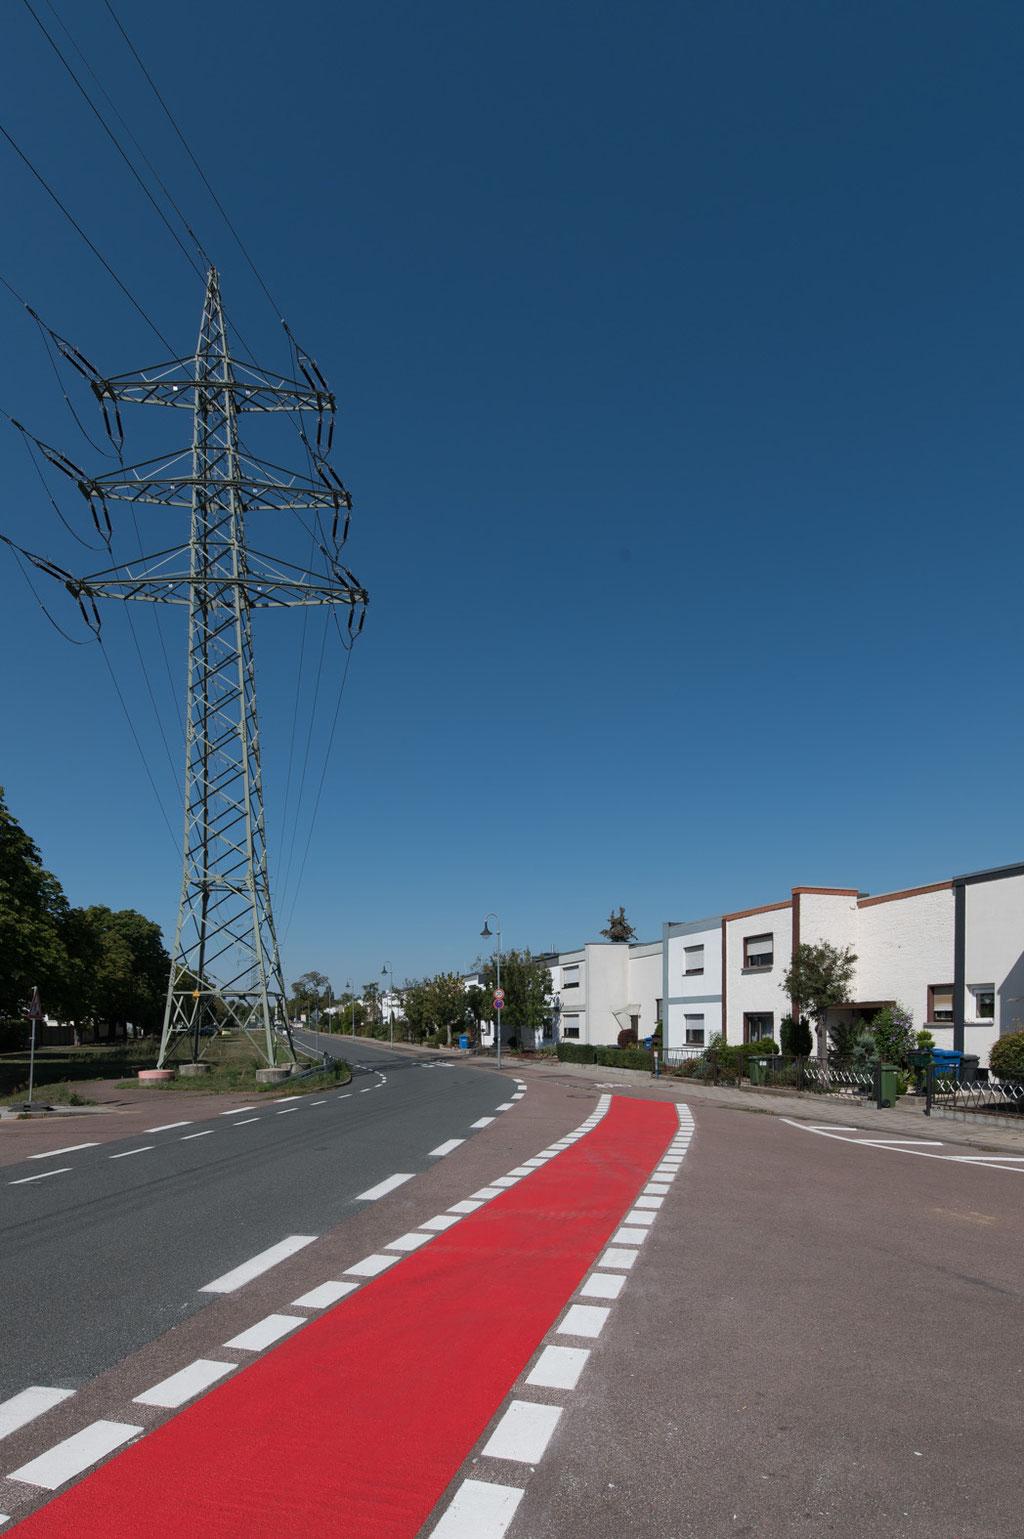 Reihenhäuser (Walter Gropius), Siedlung Törten, Dessau (D)